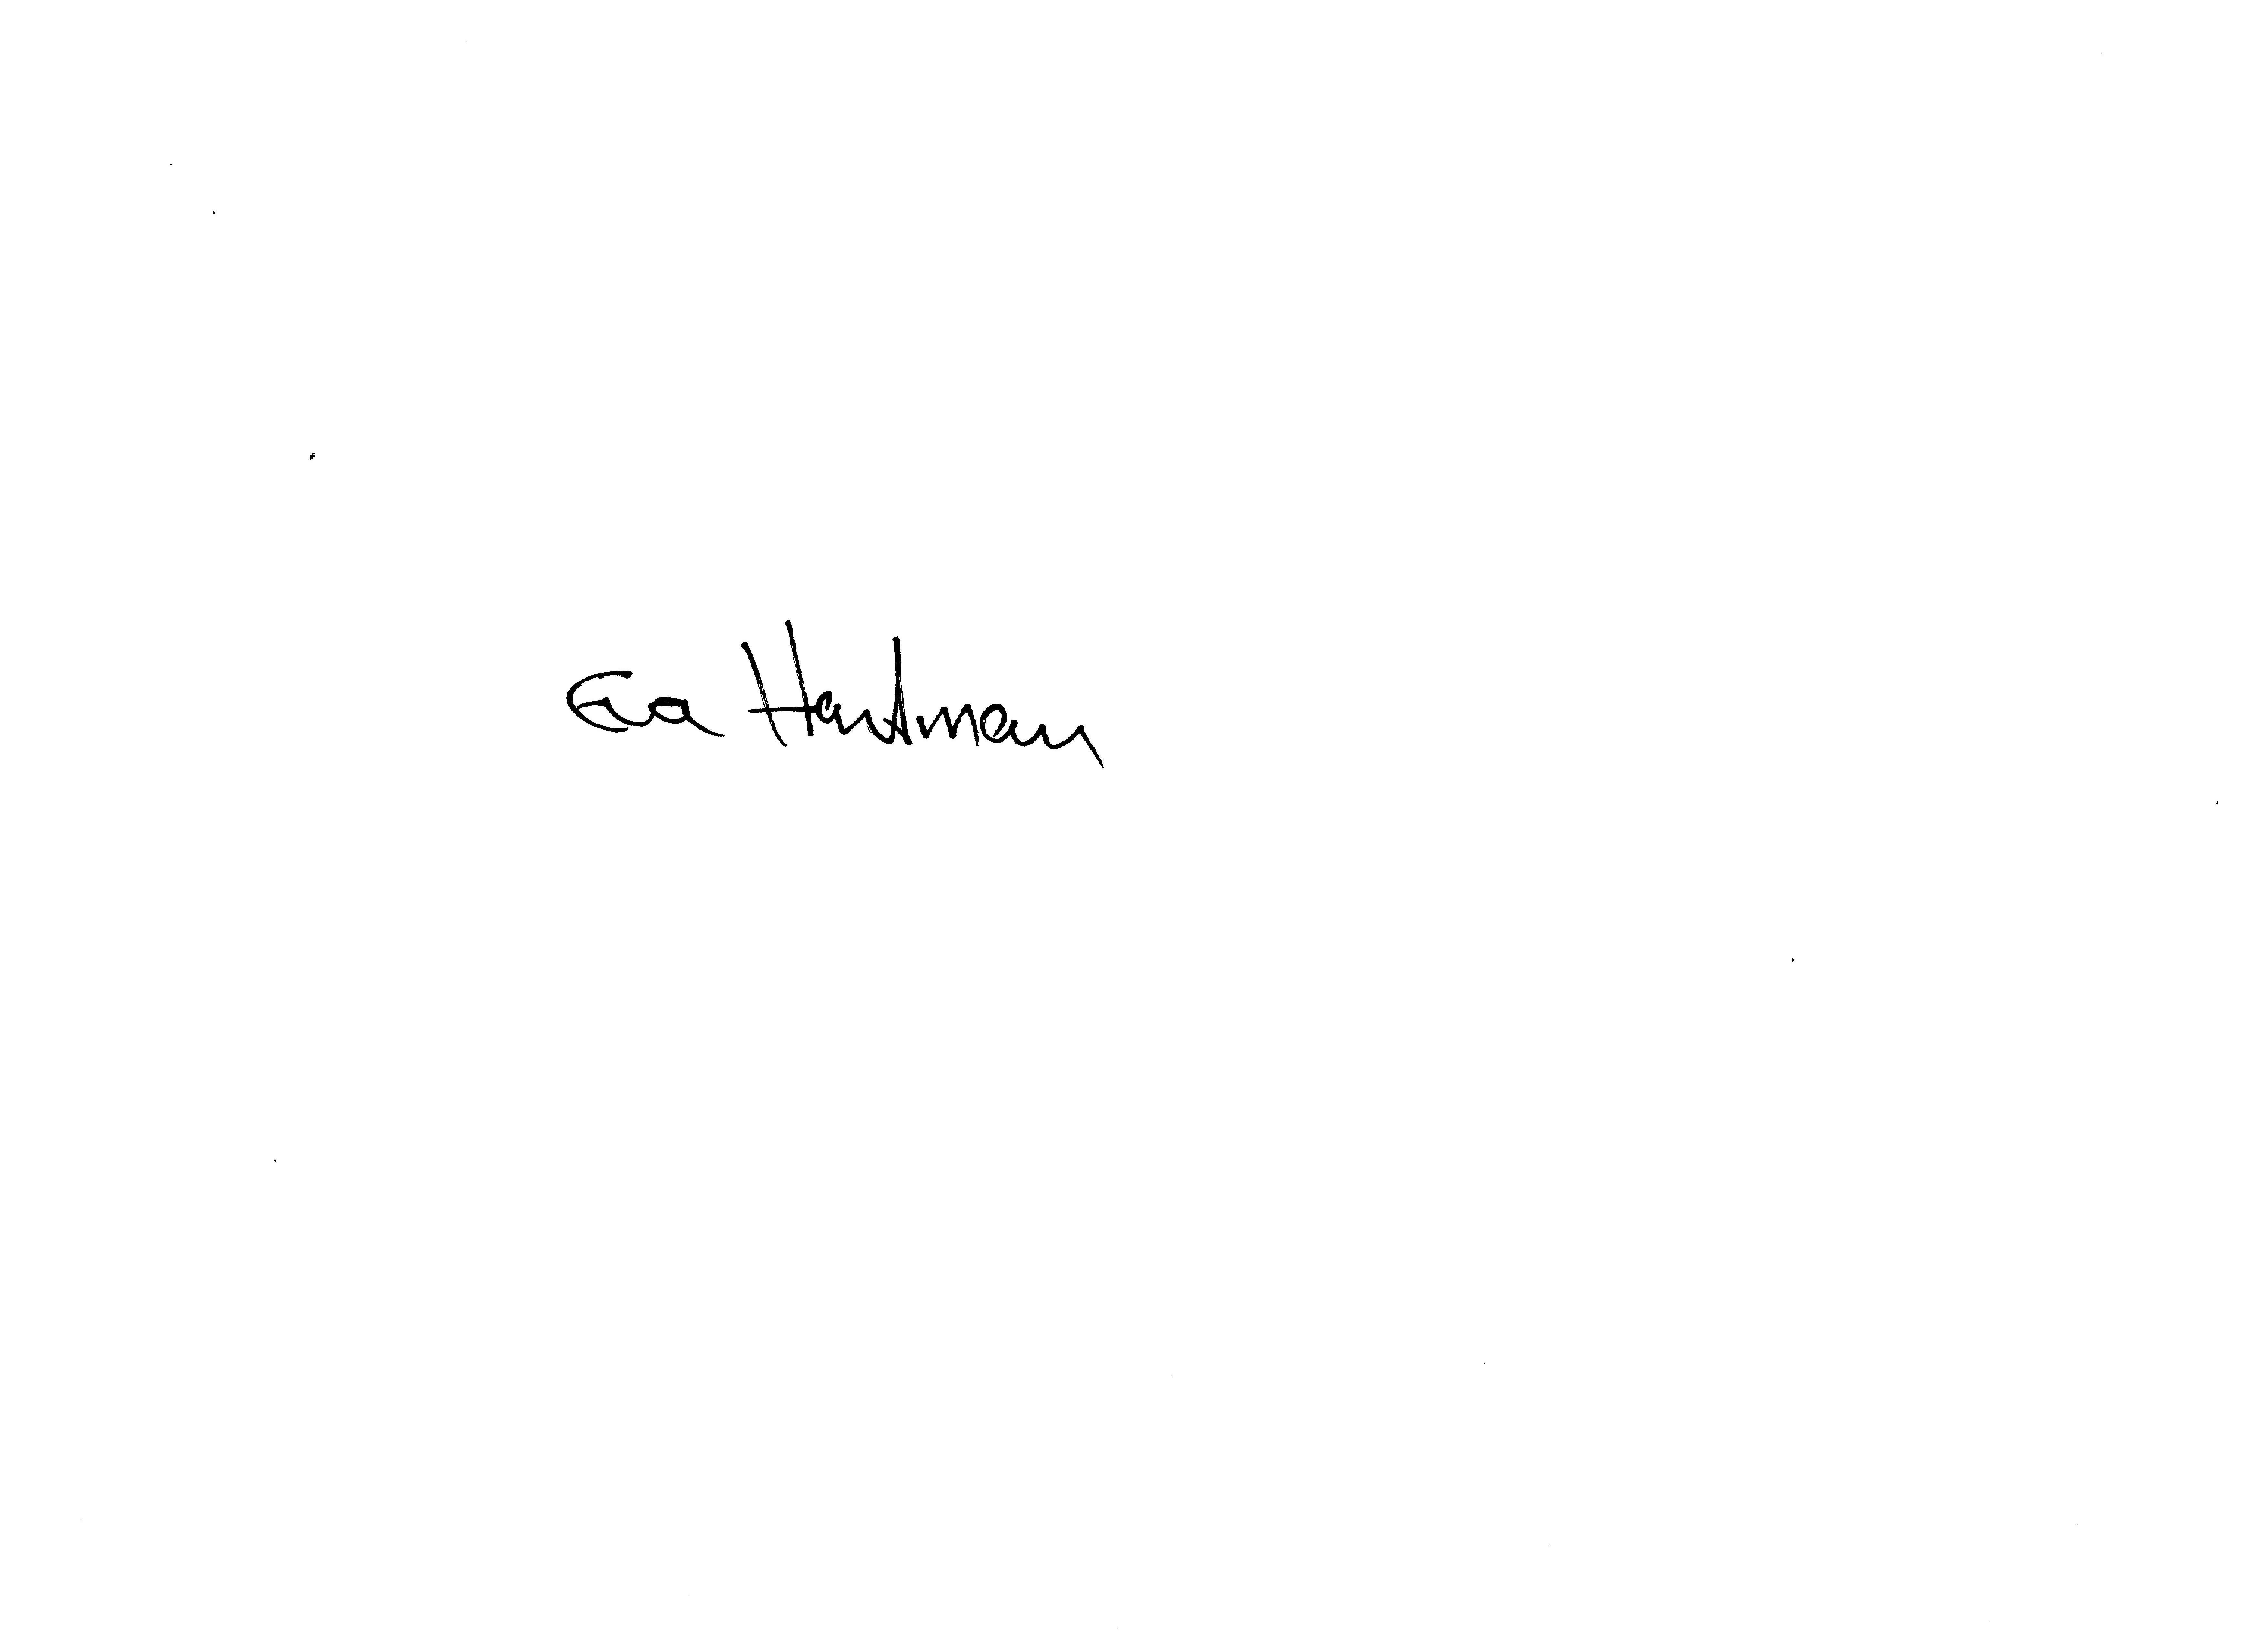 Eva Hartman's Signature